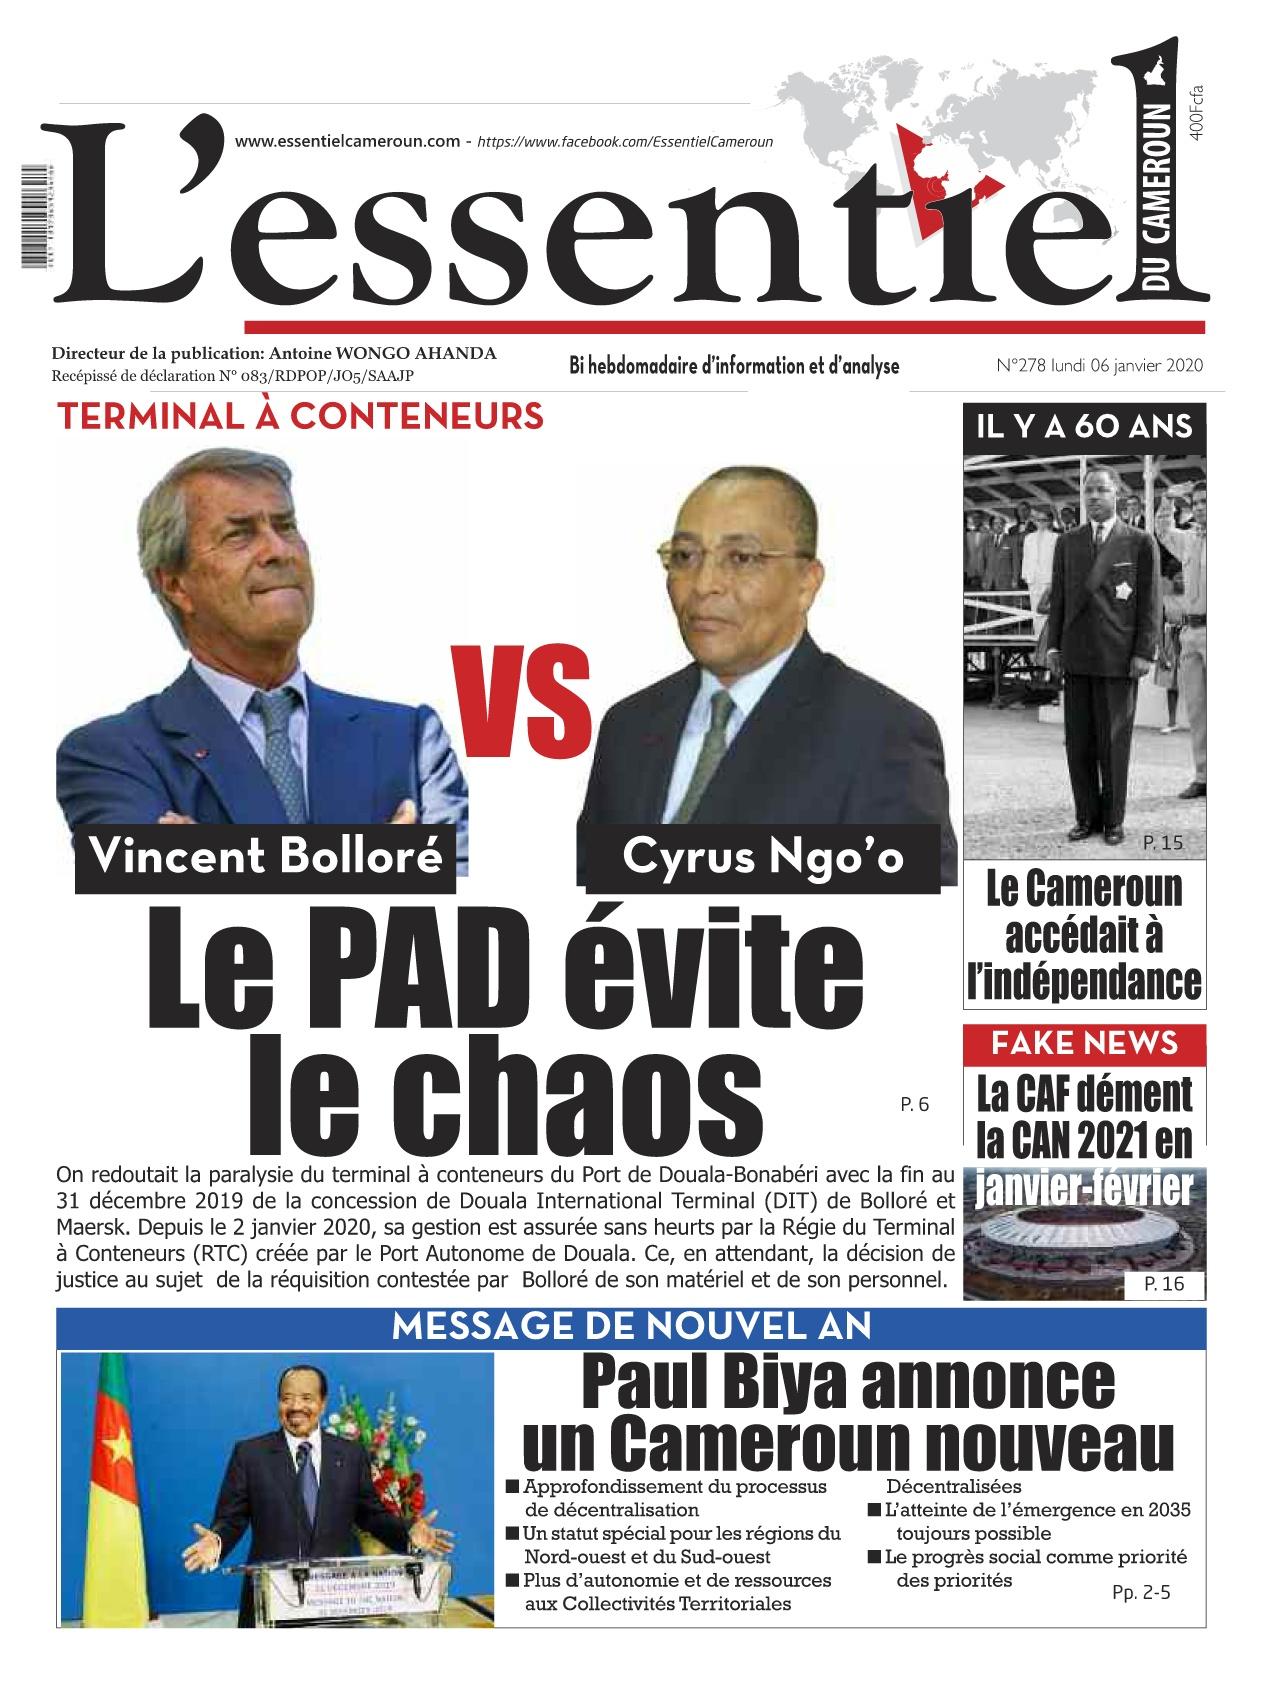 L'essentiel du Cameroun - 06/01/2020